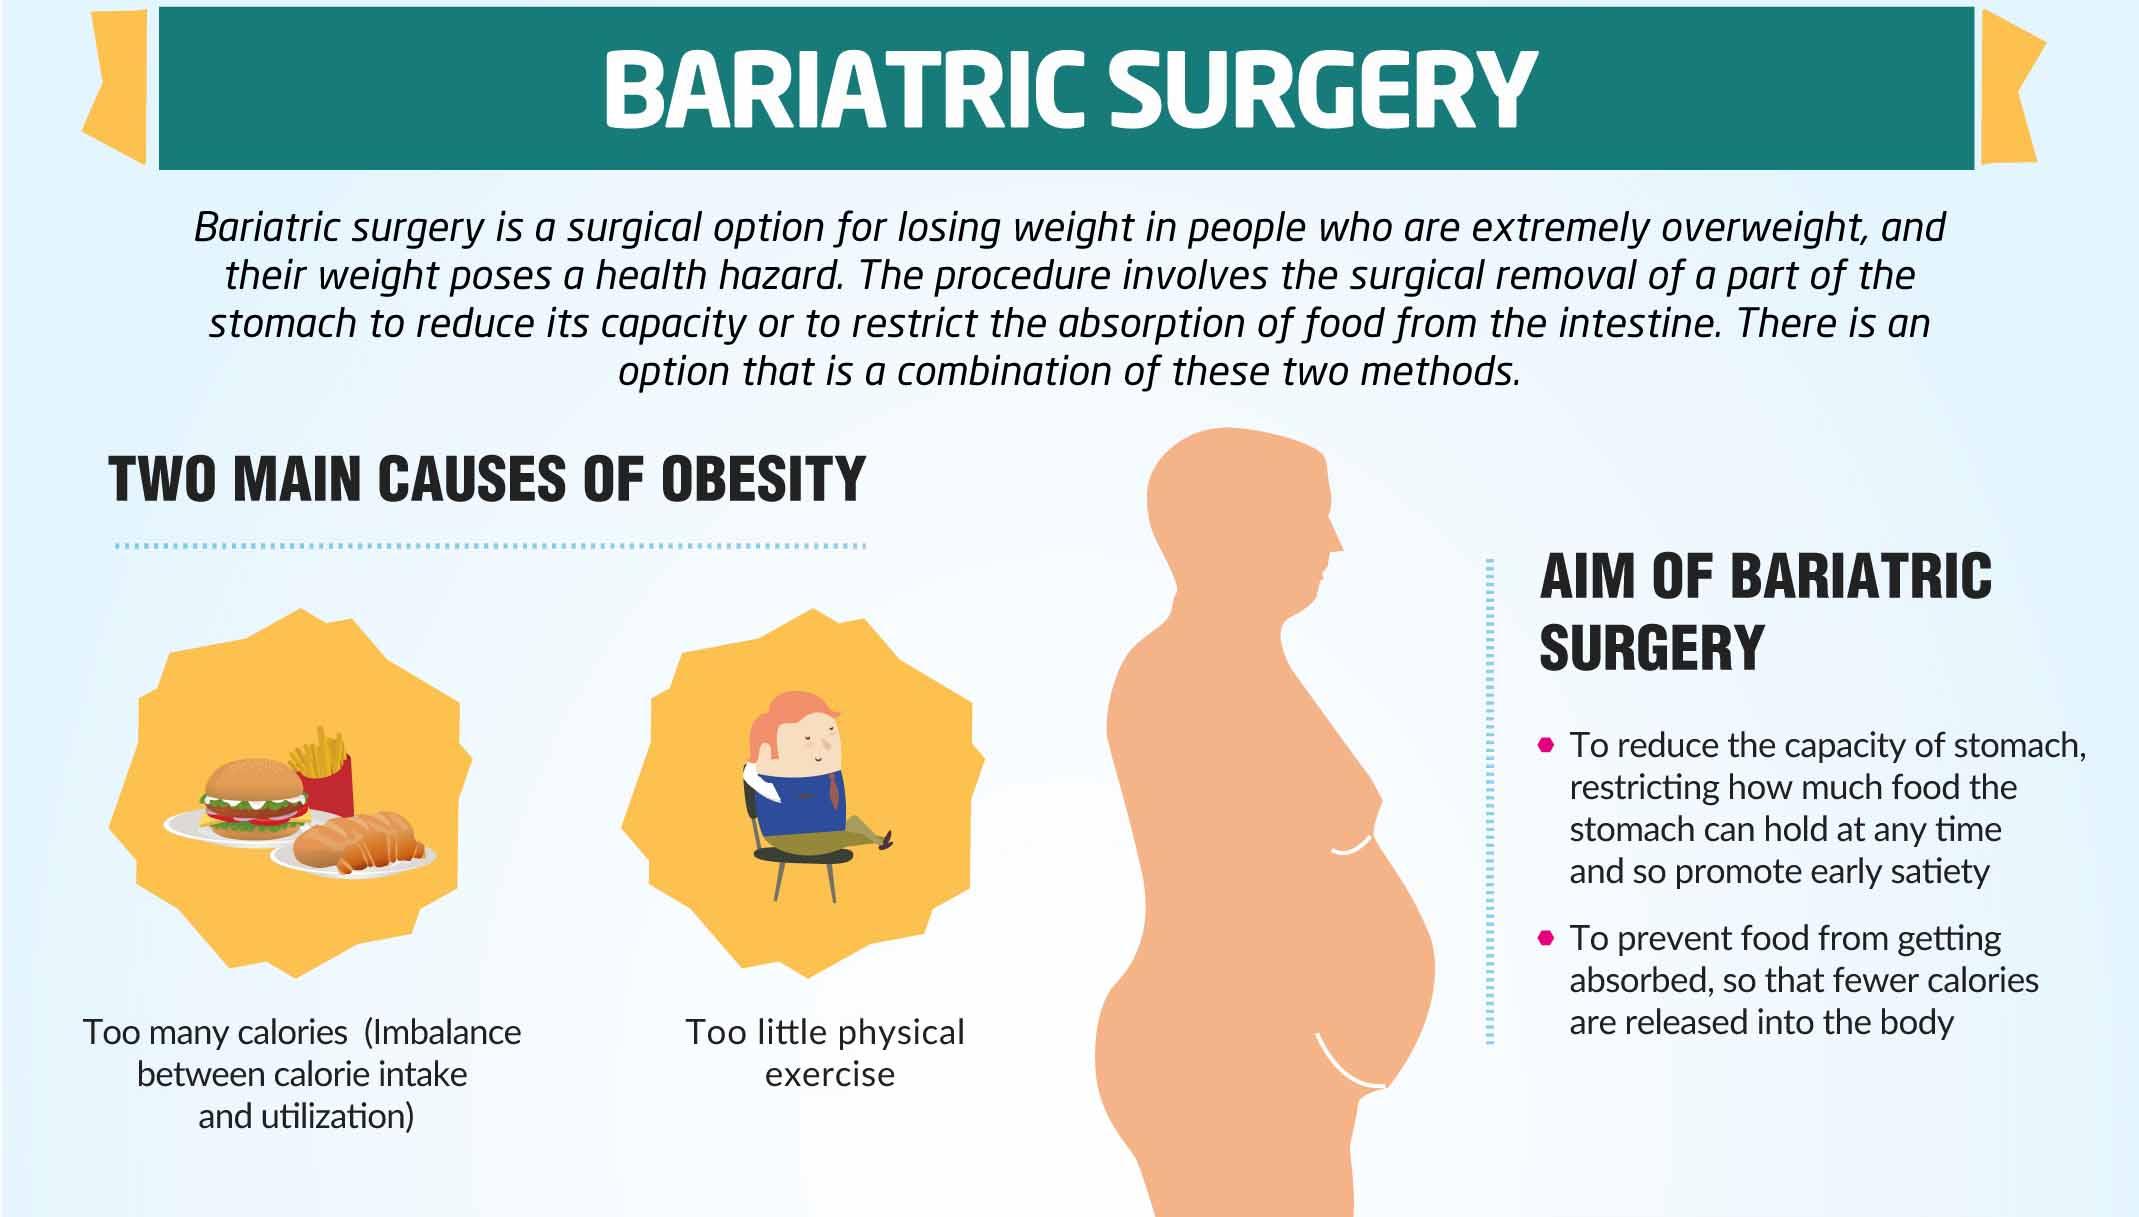 Bariatic surgery